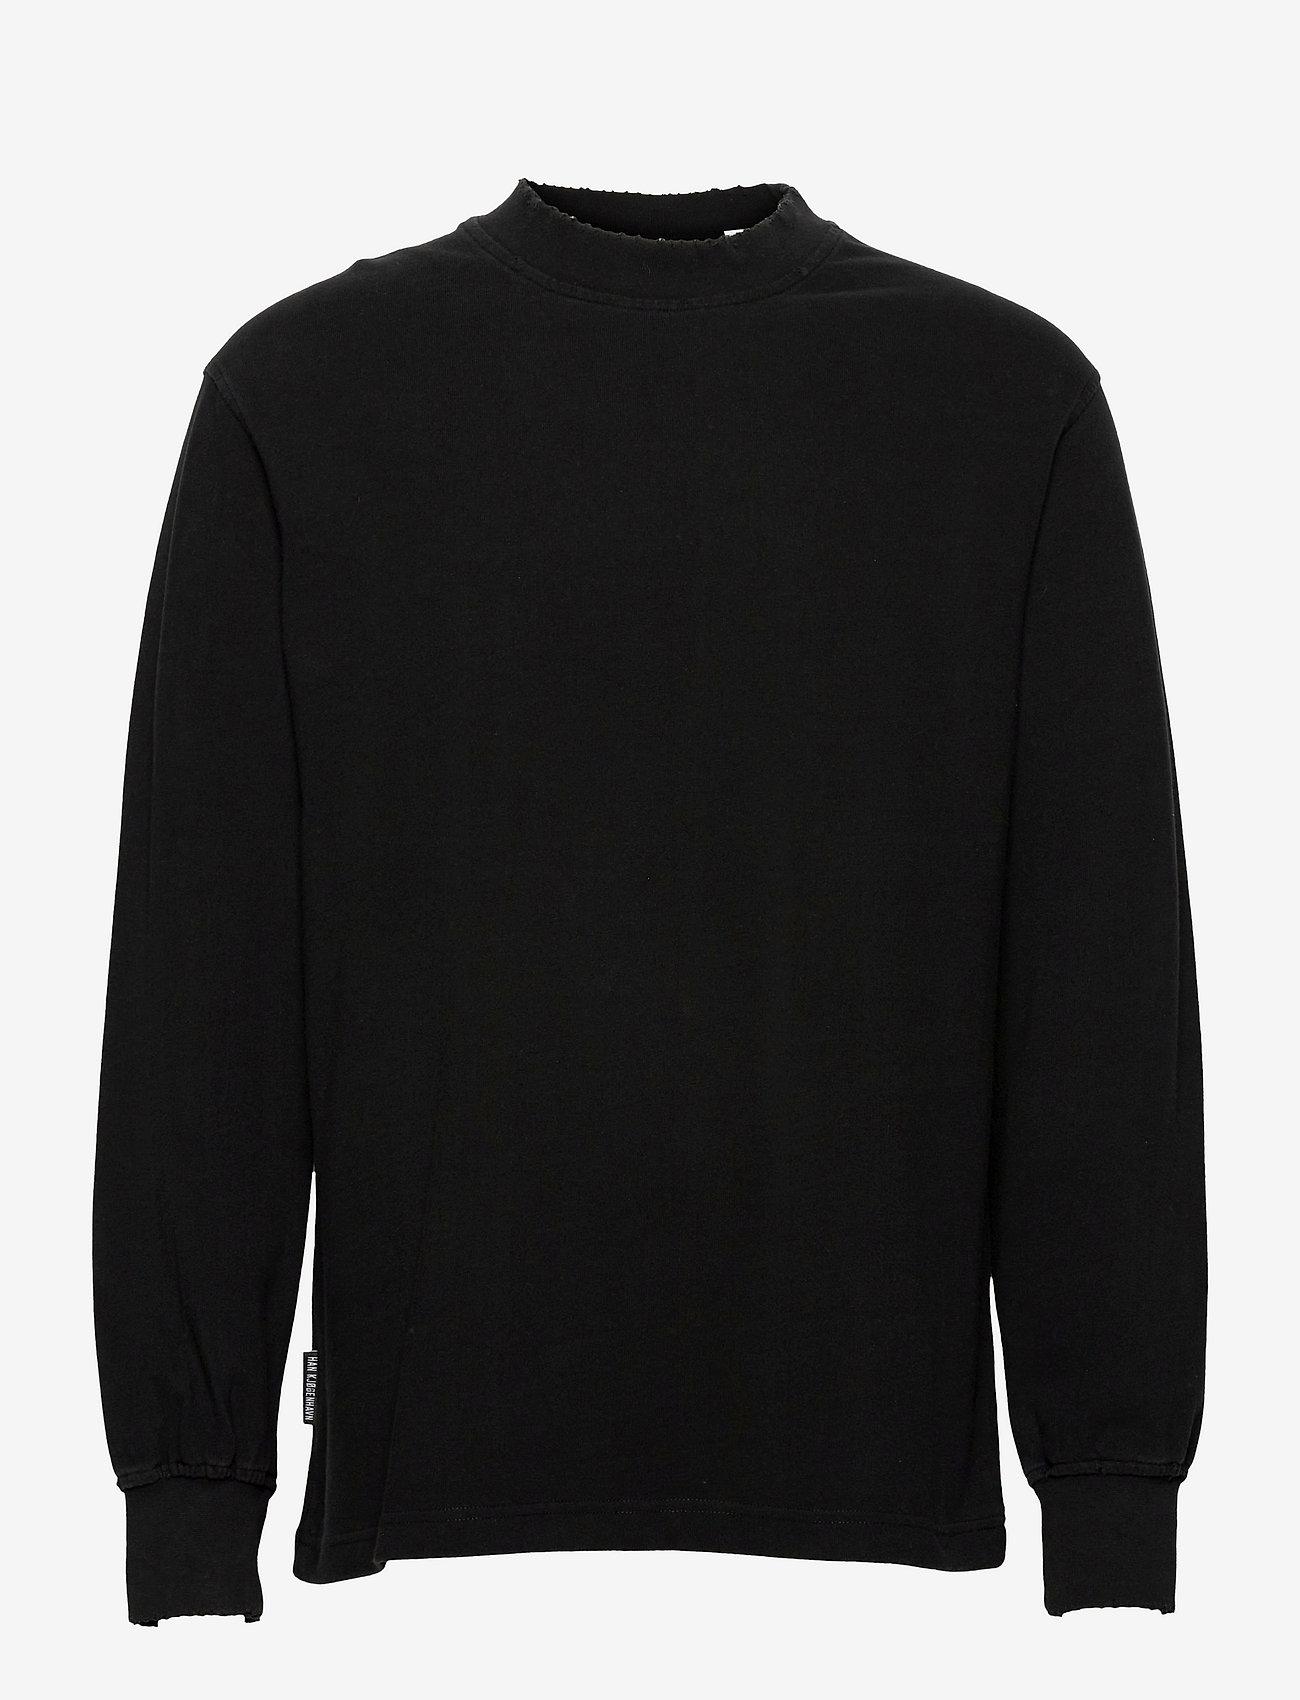 HAN Kjøbenhavn - Distressed Tee Long Sleeve - basic t-shirts - distressed black - 0